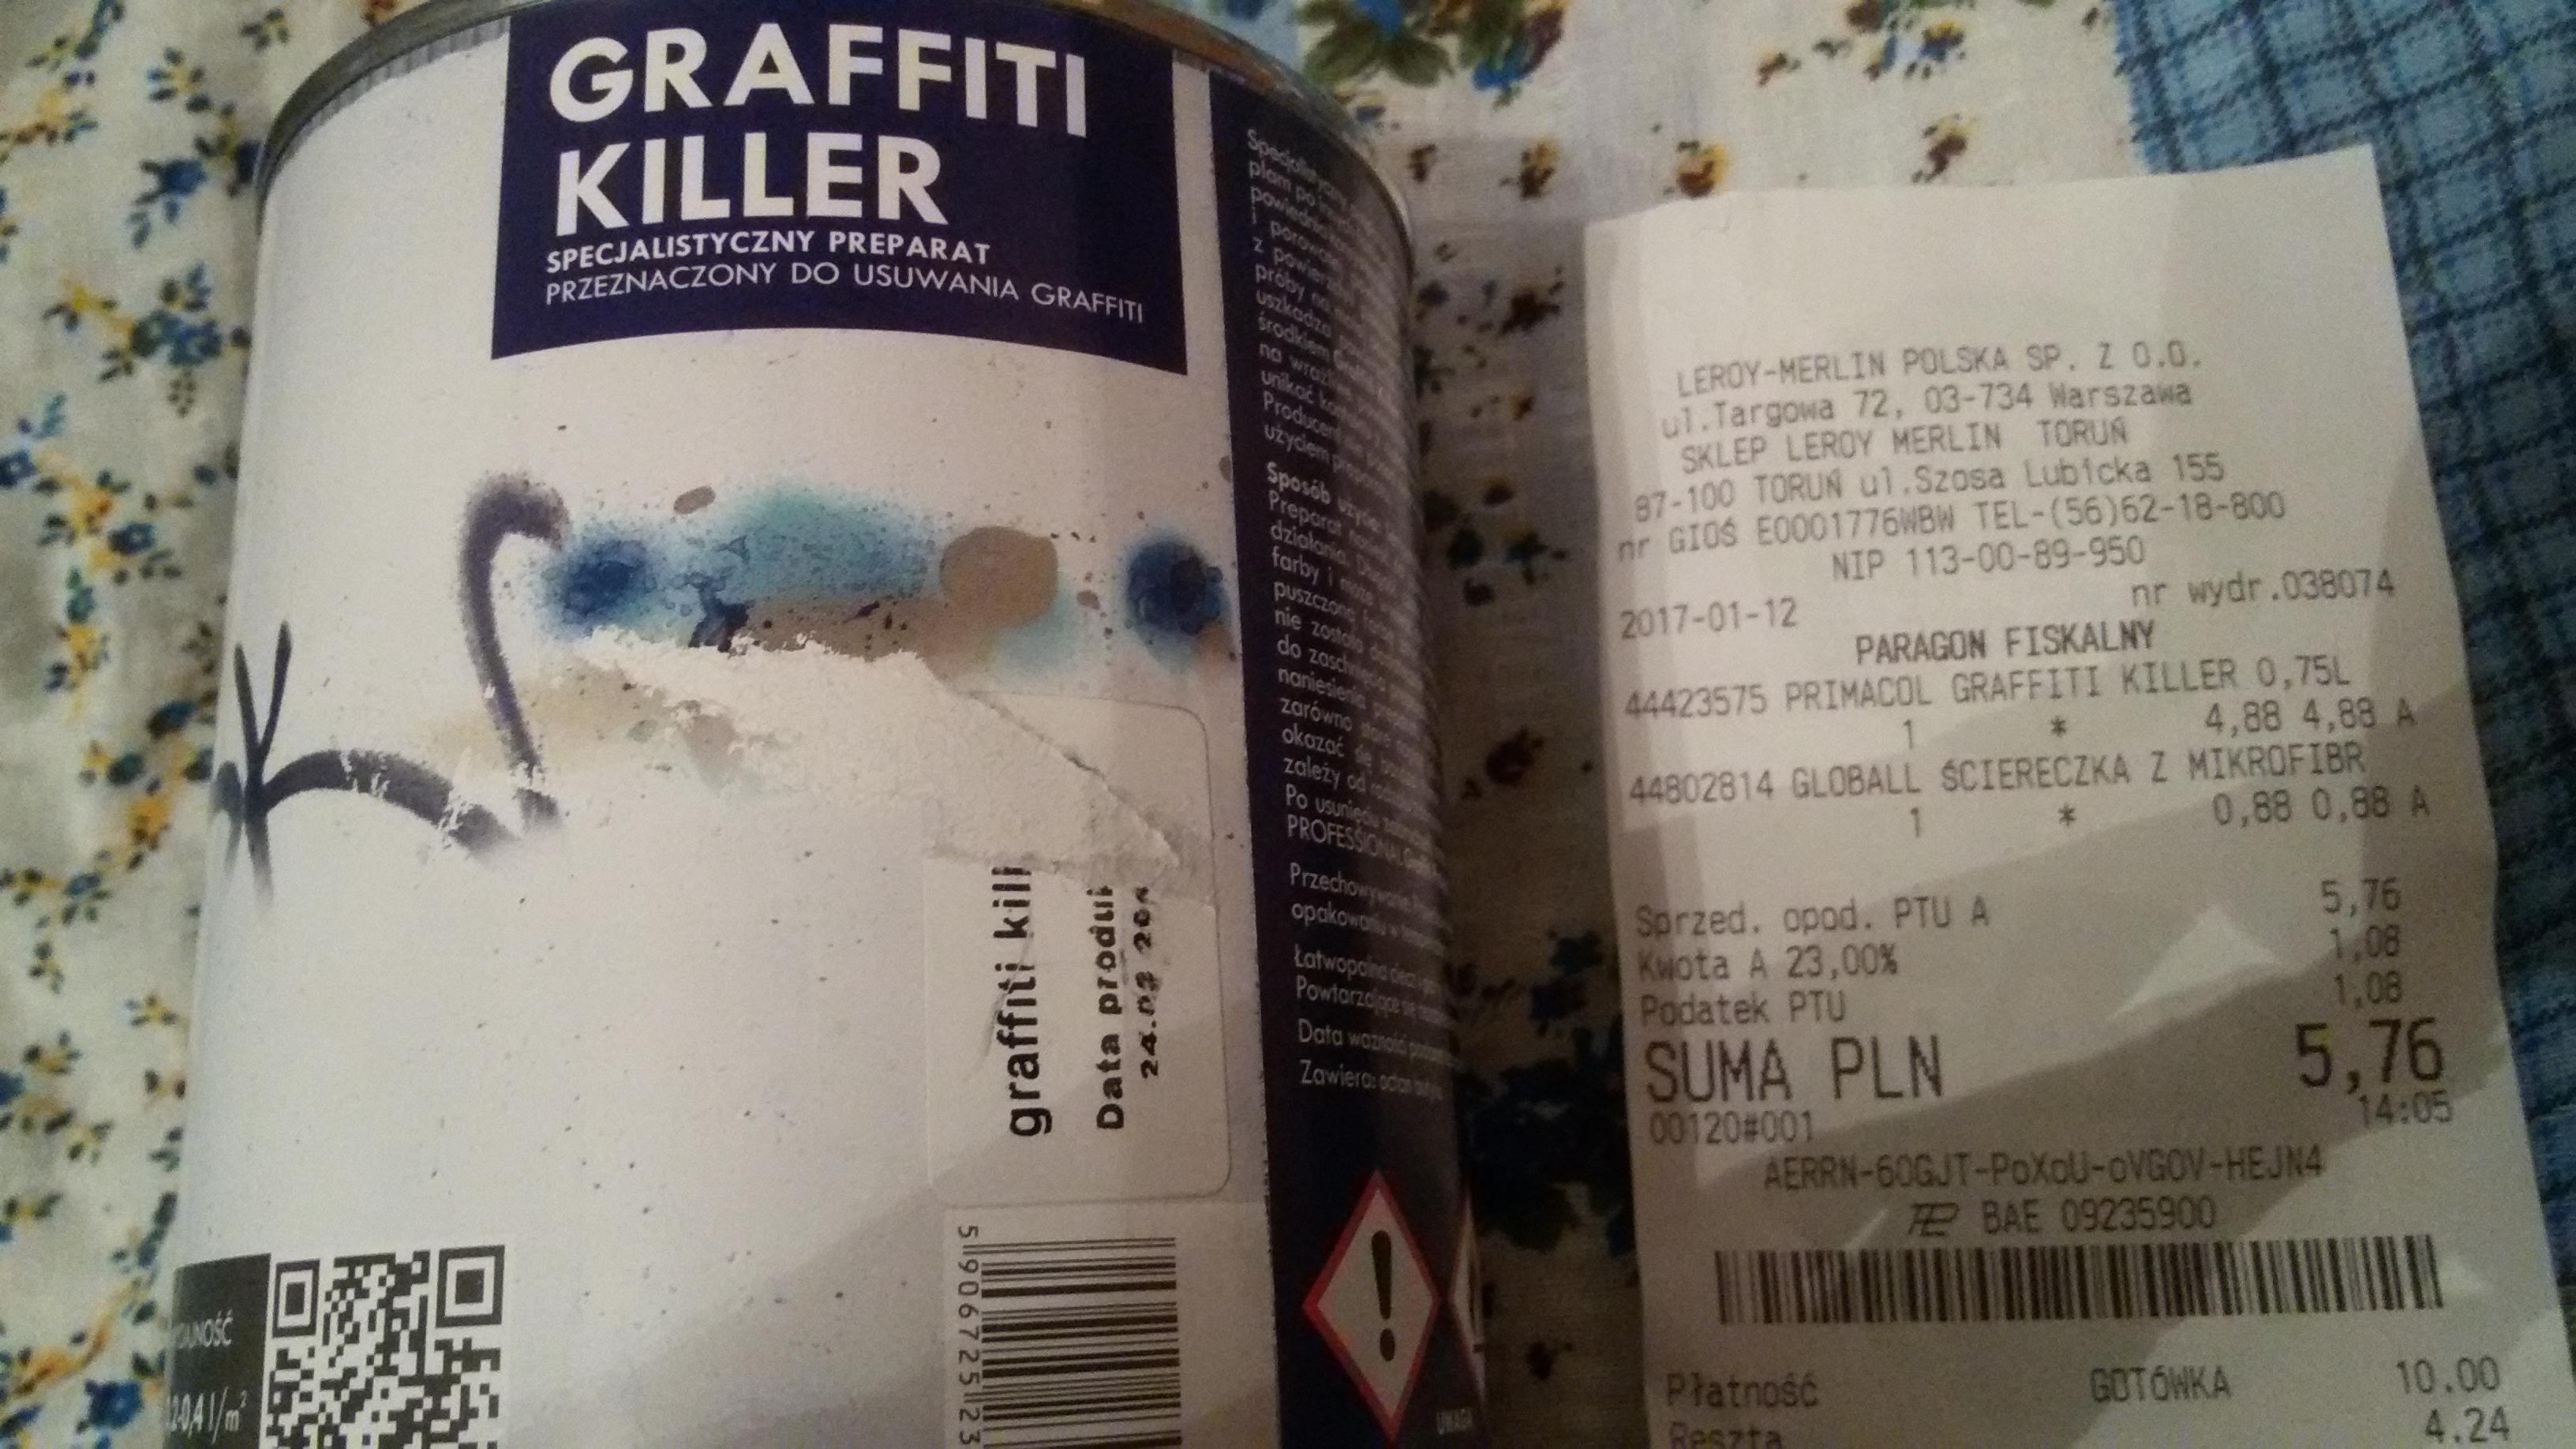 Primacol Graffiti Killer, środek do usuwania graffiti, LEROY MERLIN, WYPRZEDAŻ